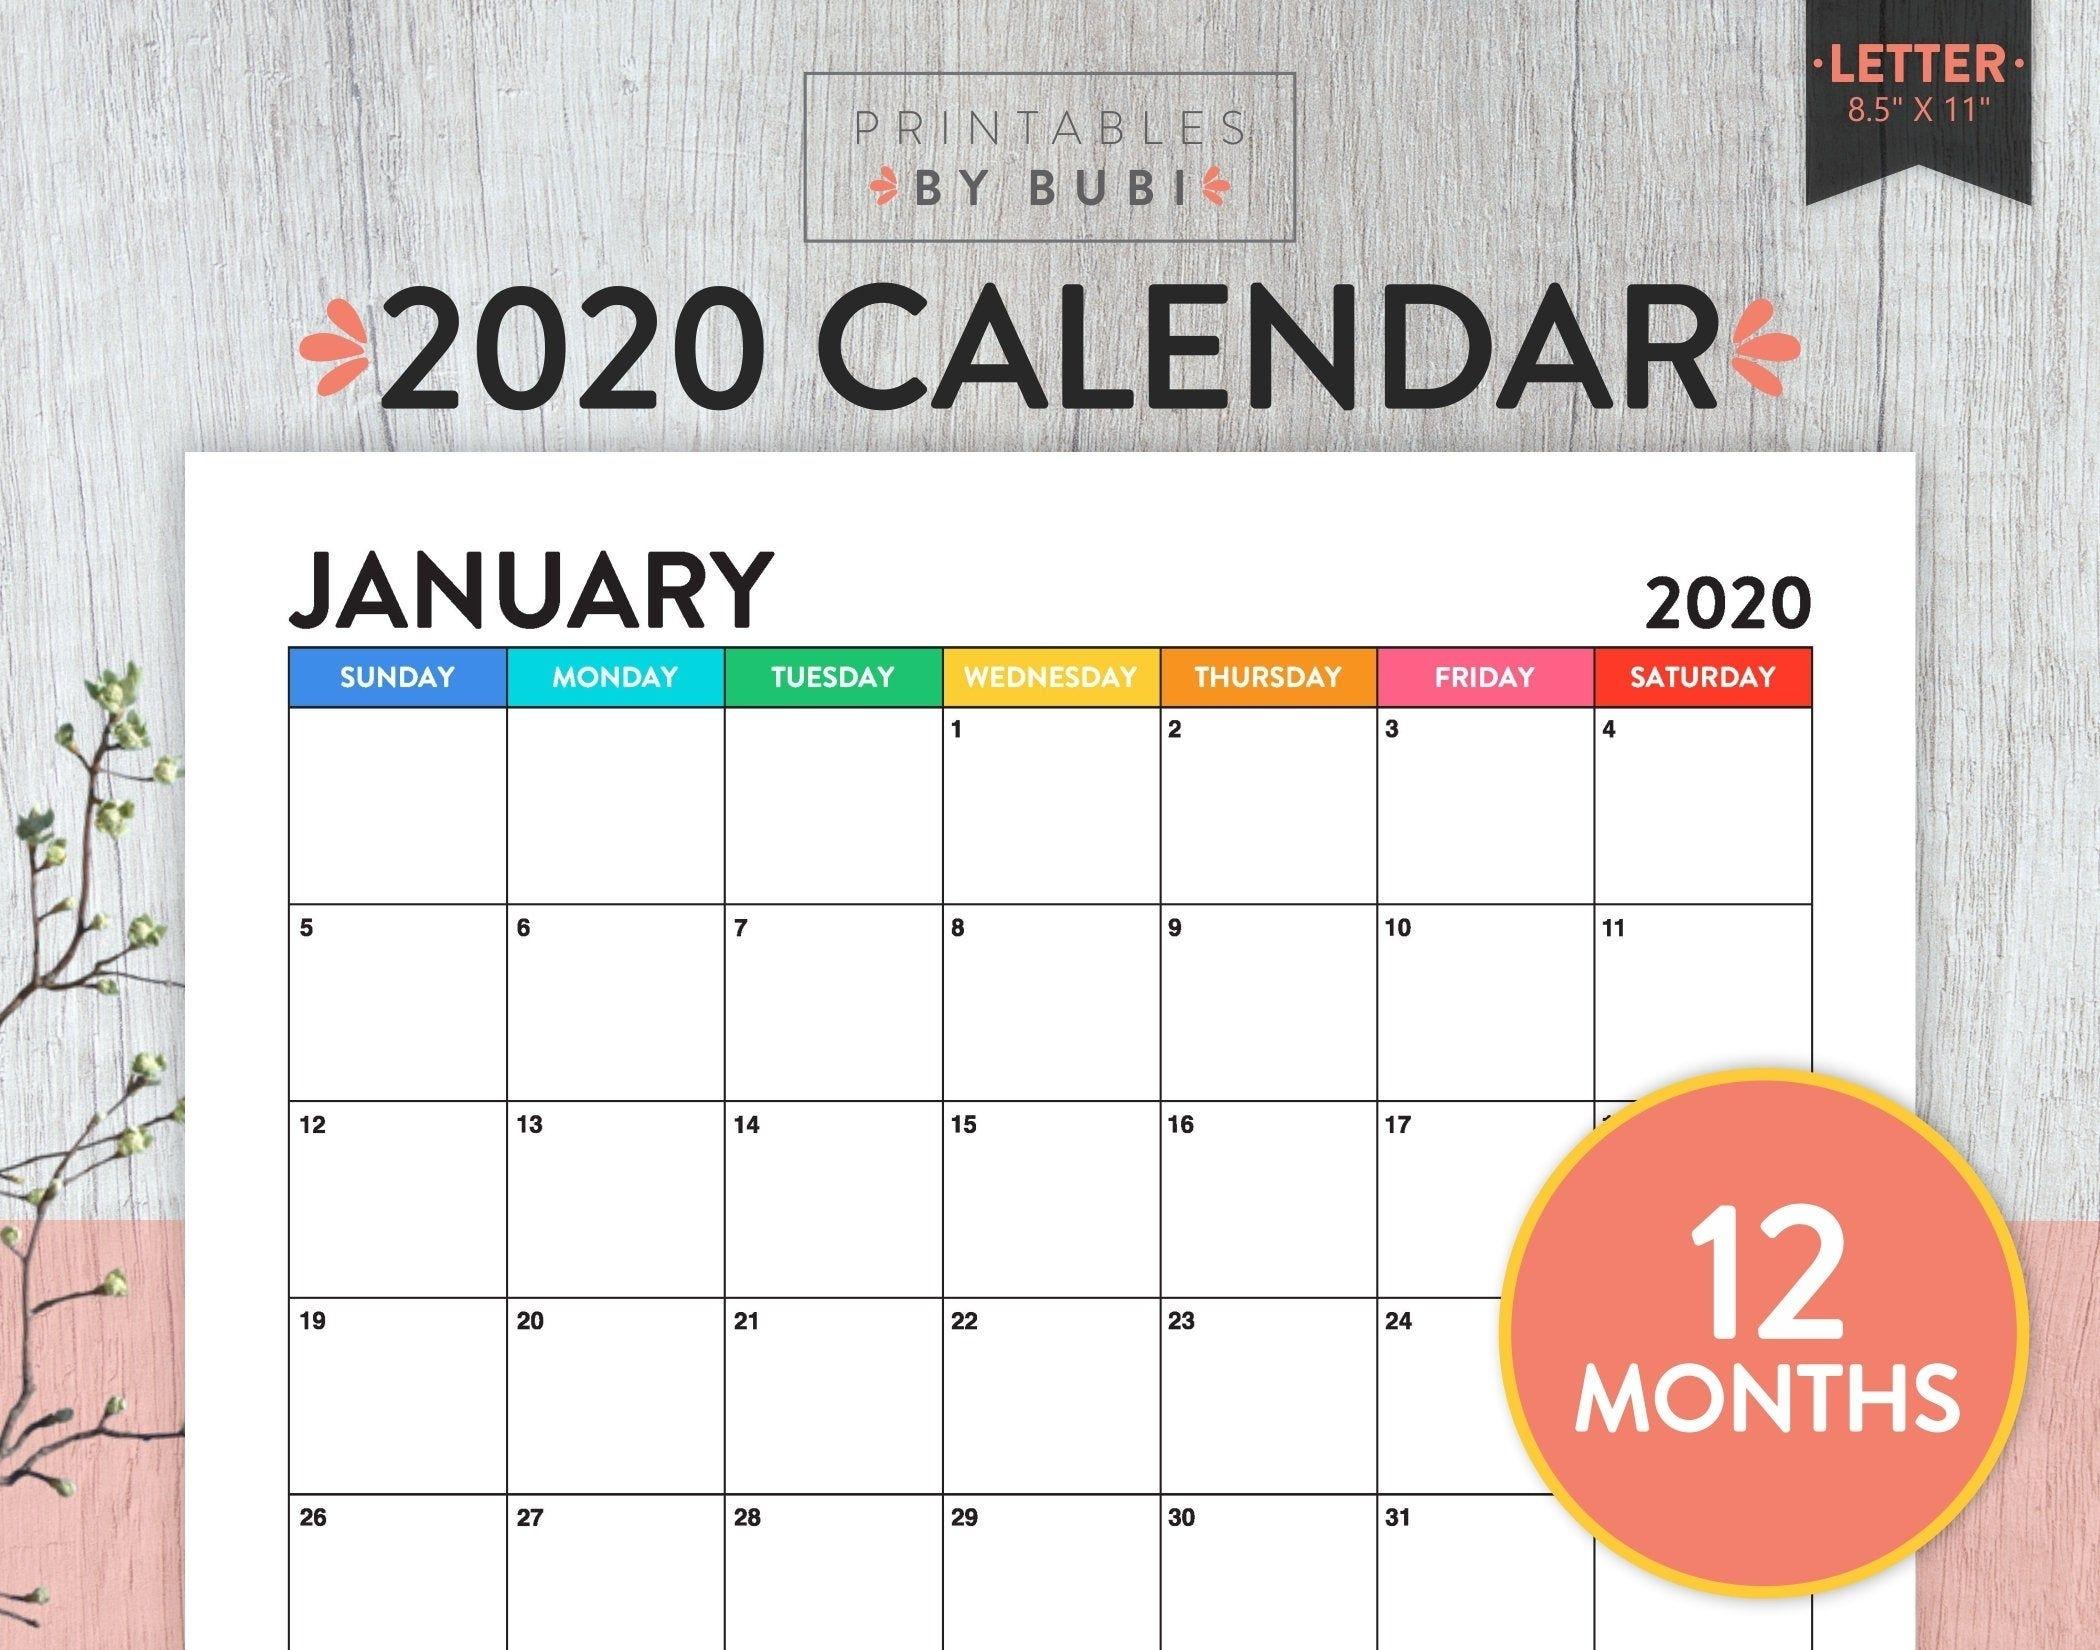 Sale! Printable Monthly Calendar 2020, Calendar Printable intended for 2020 Free 12 Month Printable Monthly Calendar